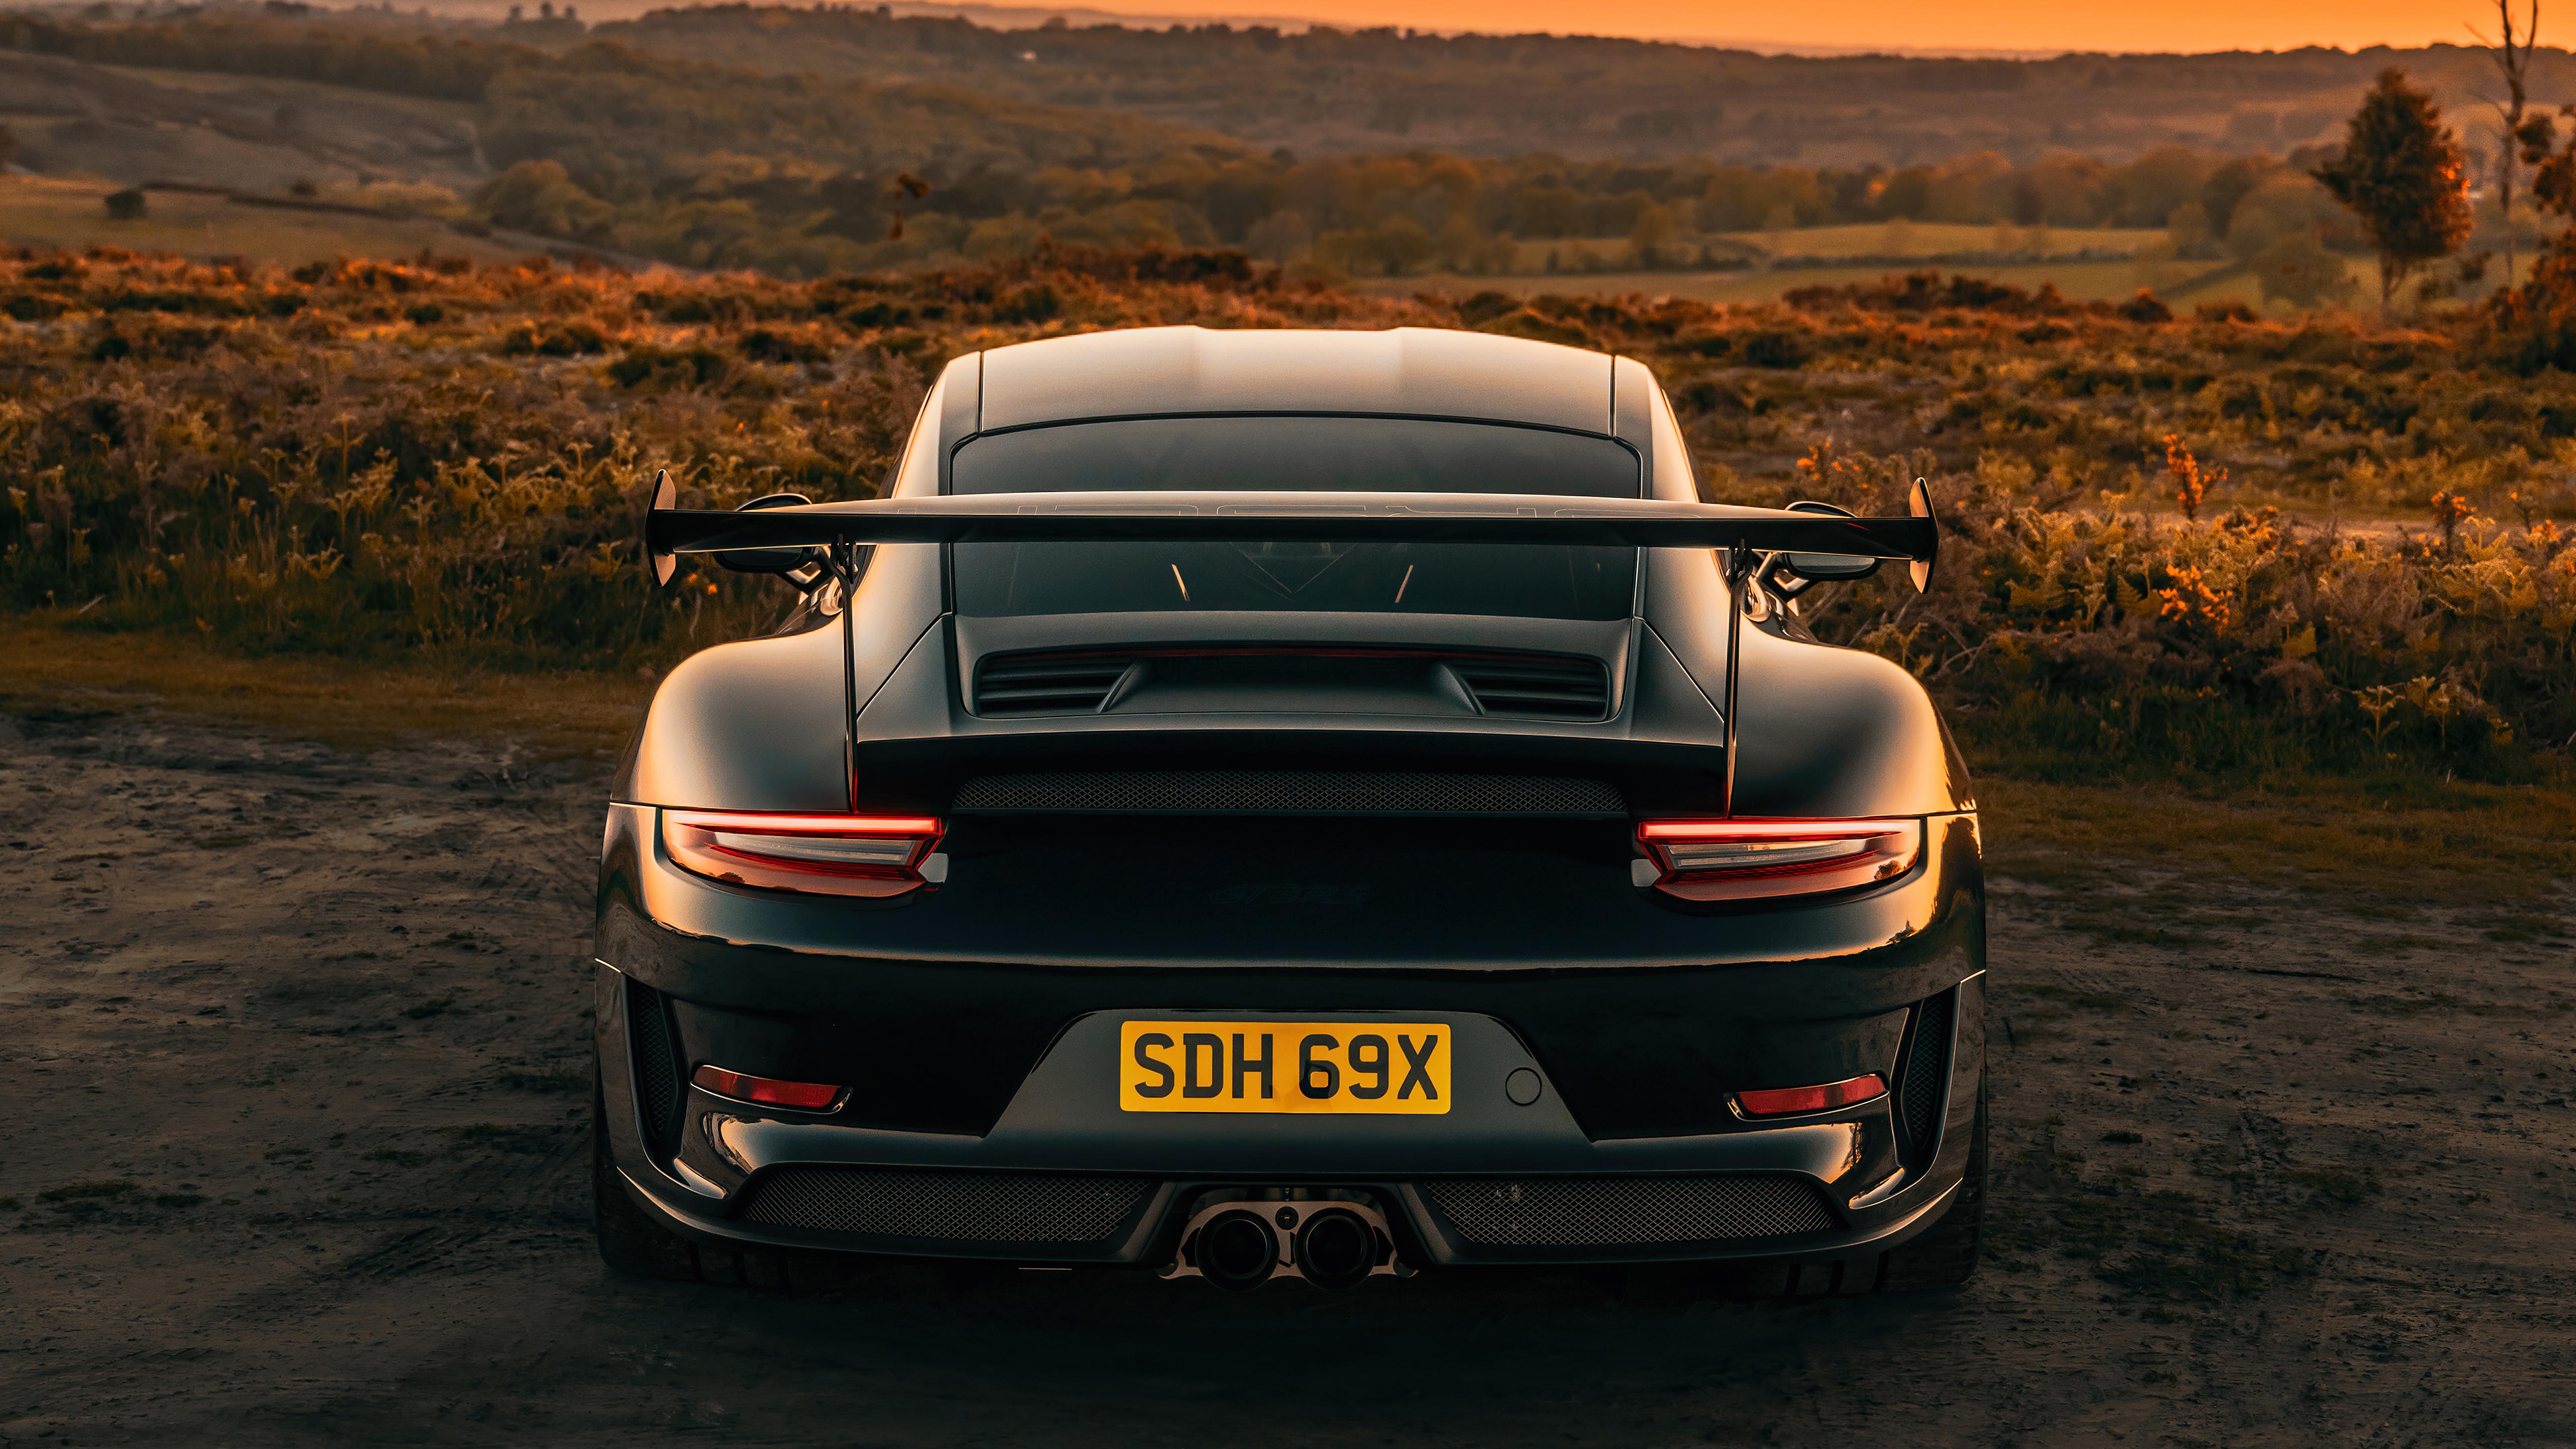 porsche gt3rs weissach 4k 1626180135 1 - Porsche GT3RS Weissach 4k - Porsche GT3RS Weissach 4k wallpapers